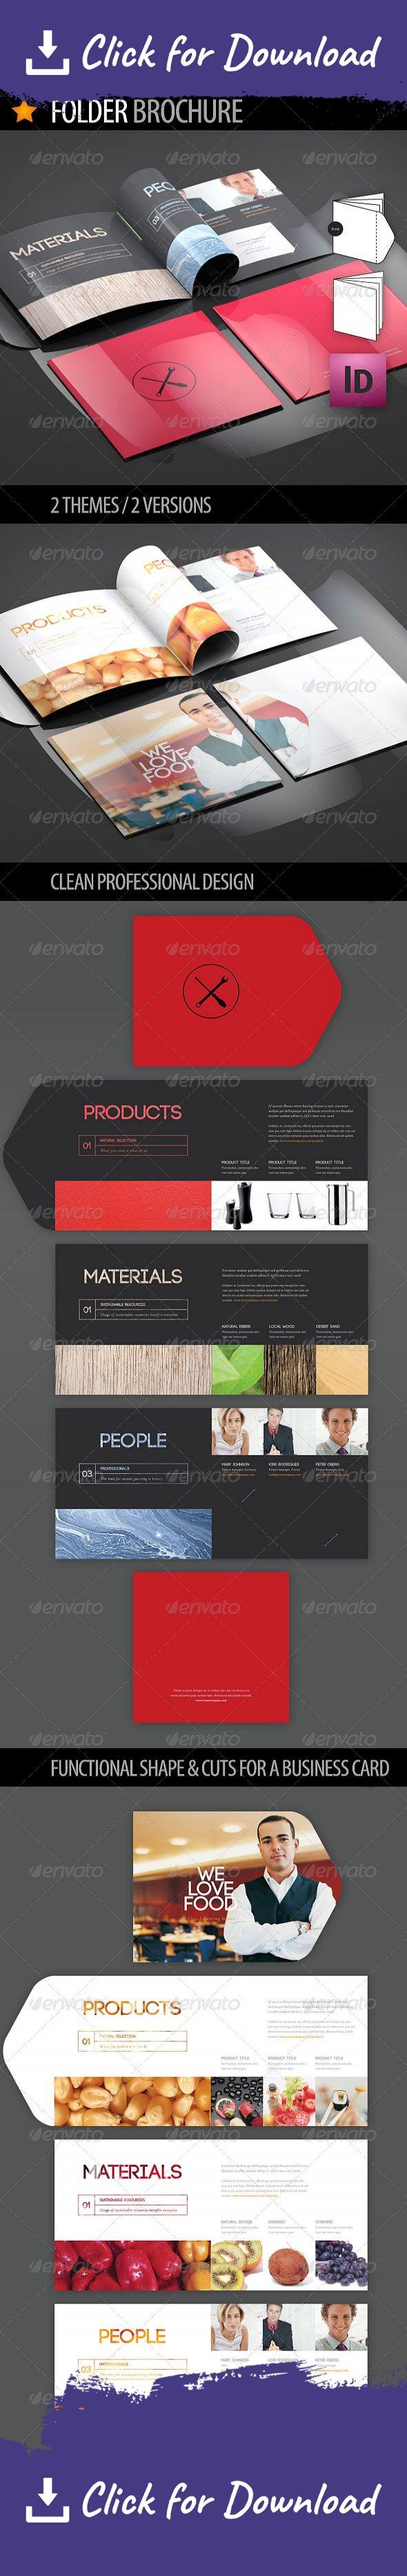 Folder Brochure | Brochures and Business cards